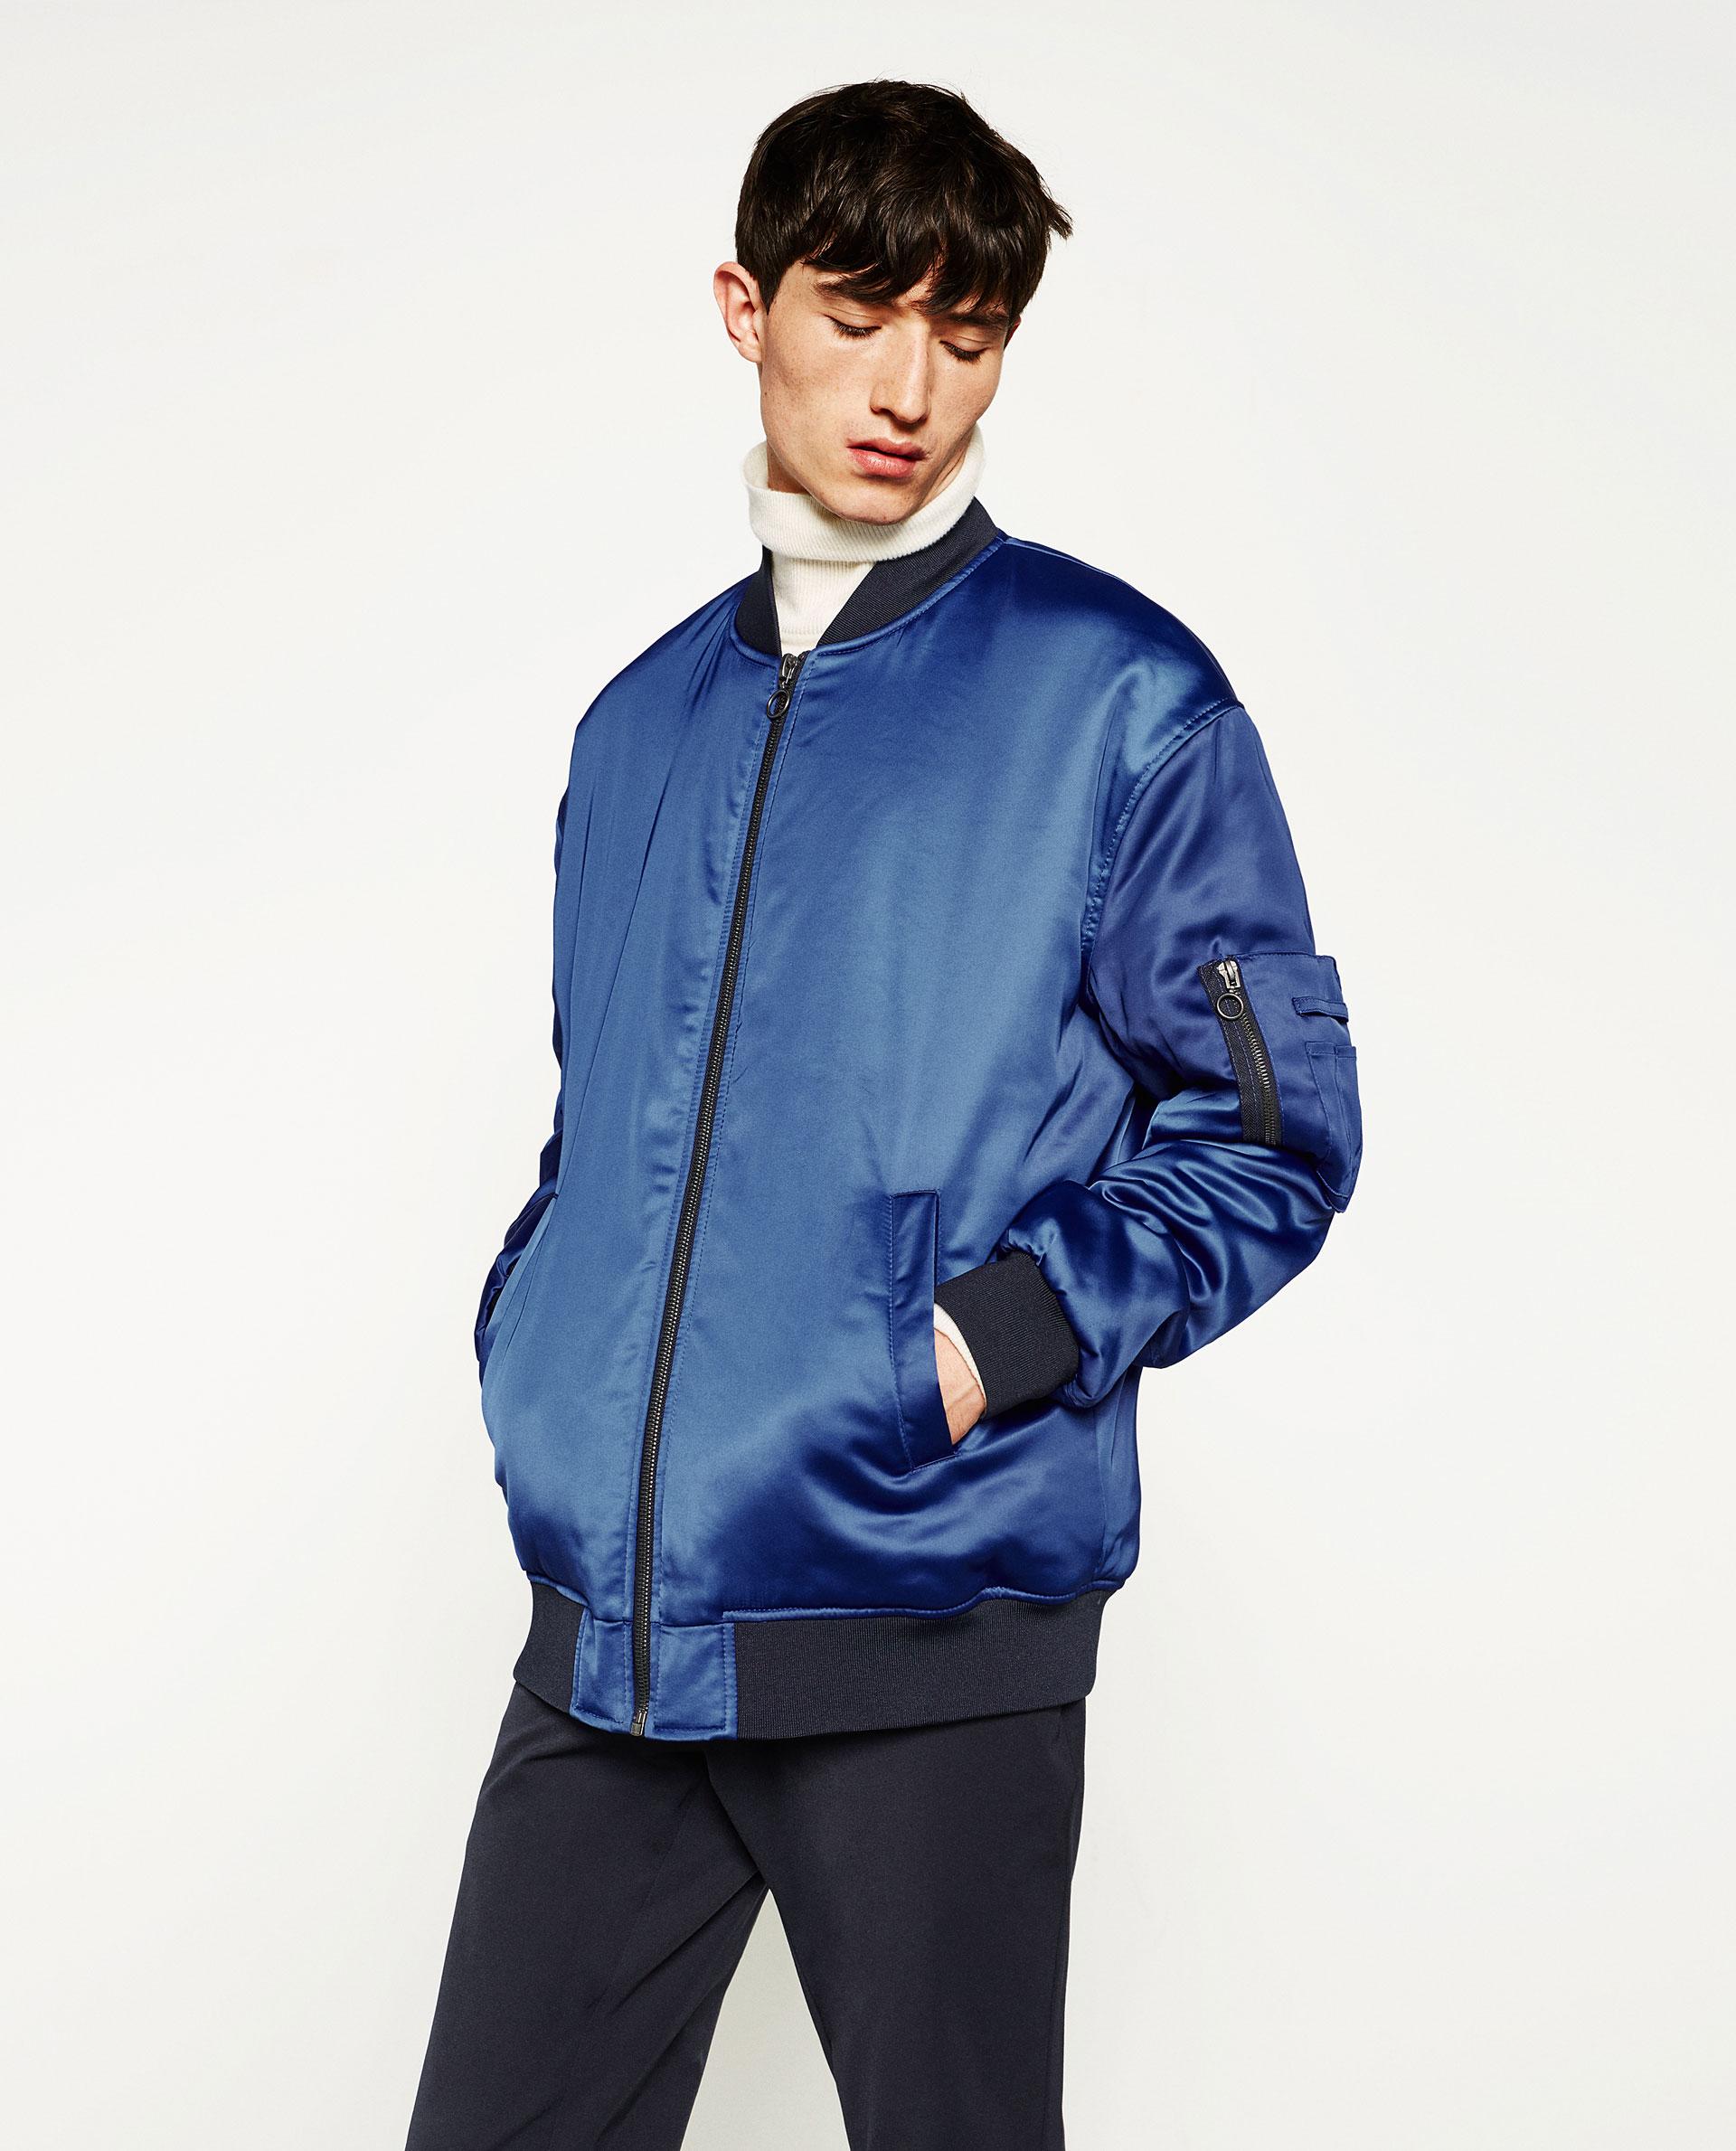 Oversized bomber jacket, £69.99 ( zara.com )